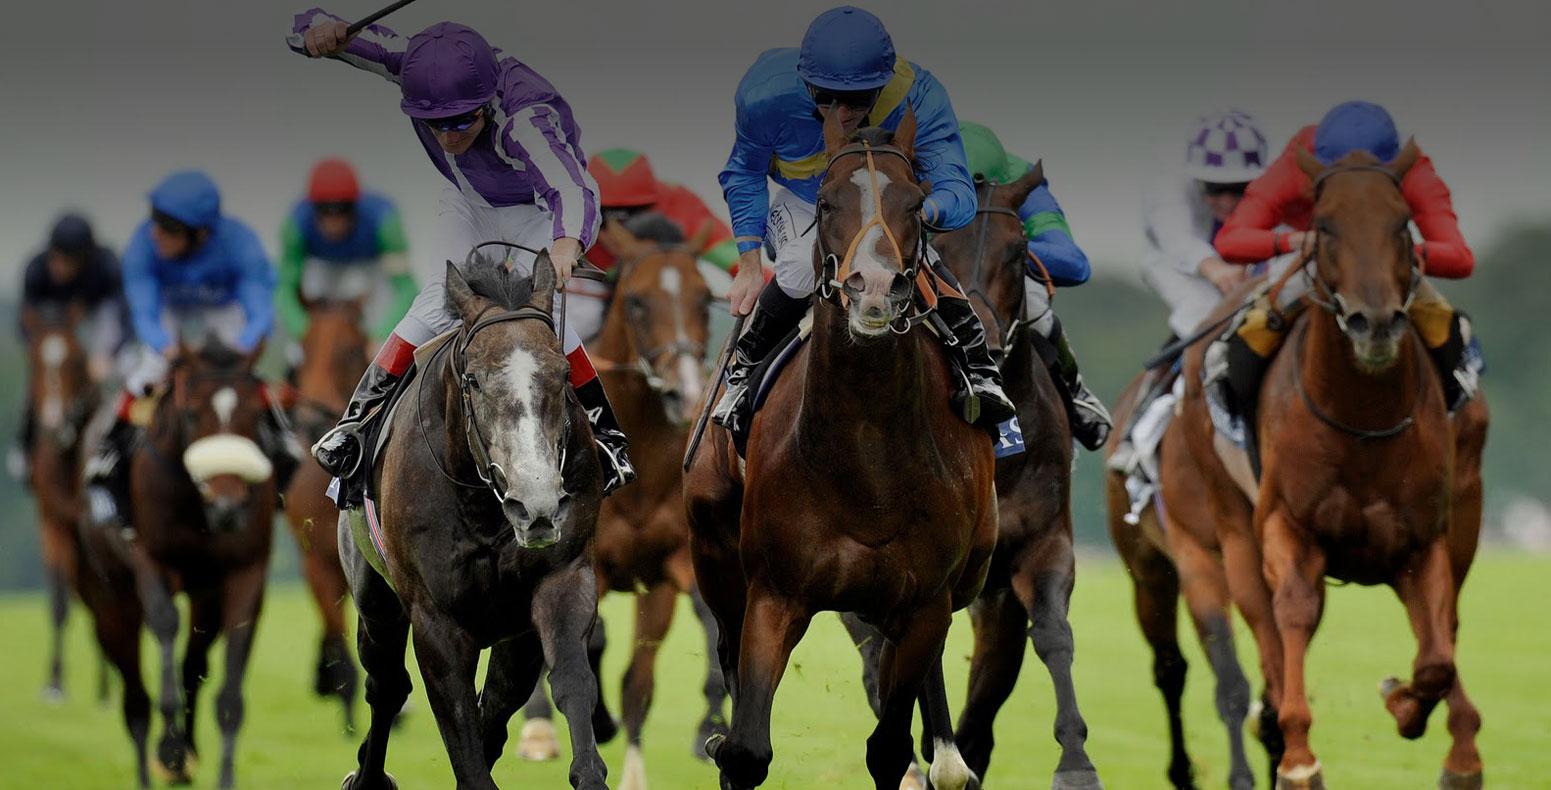 Horse racing in Killarney